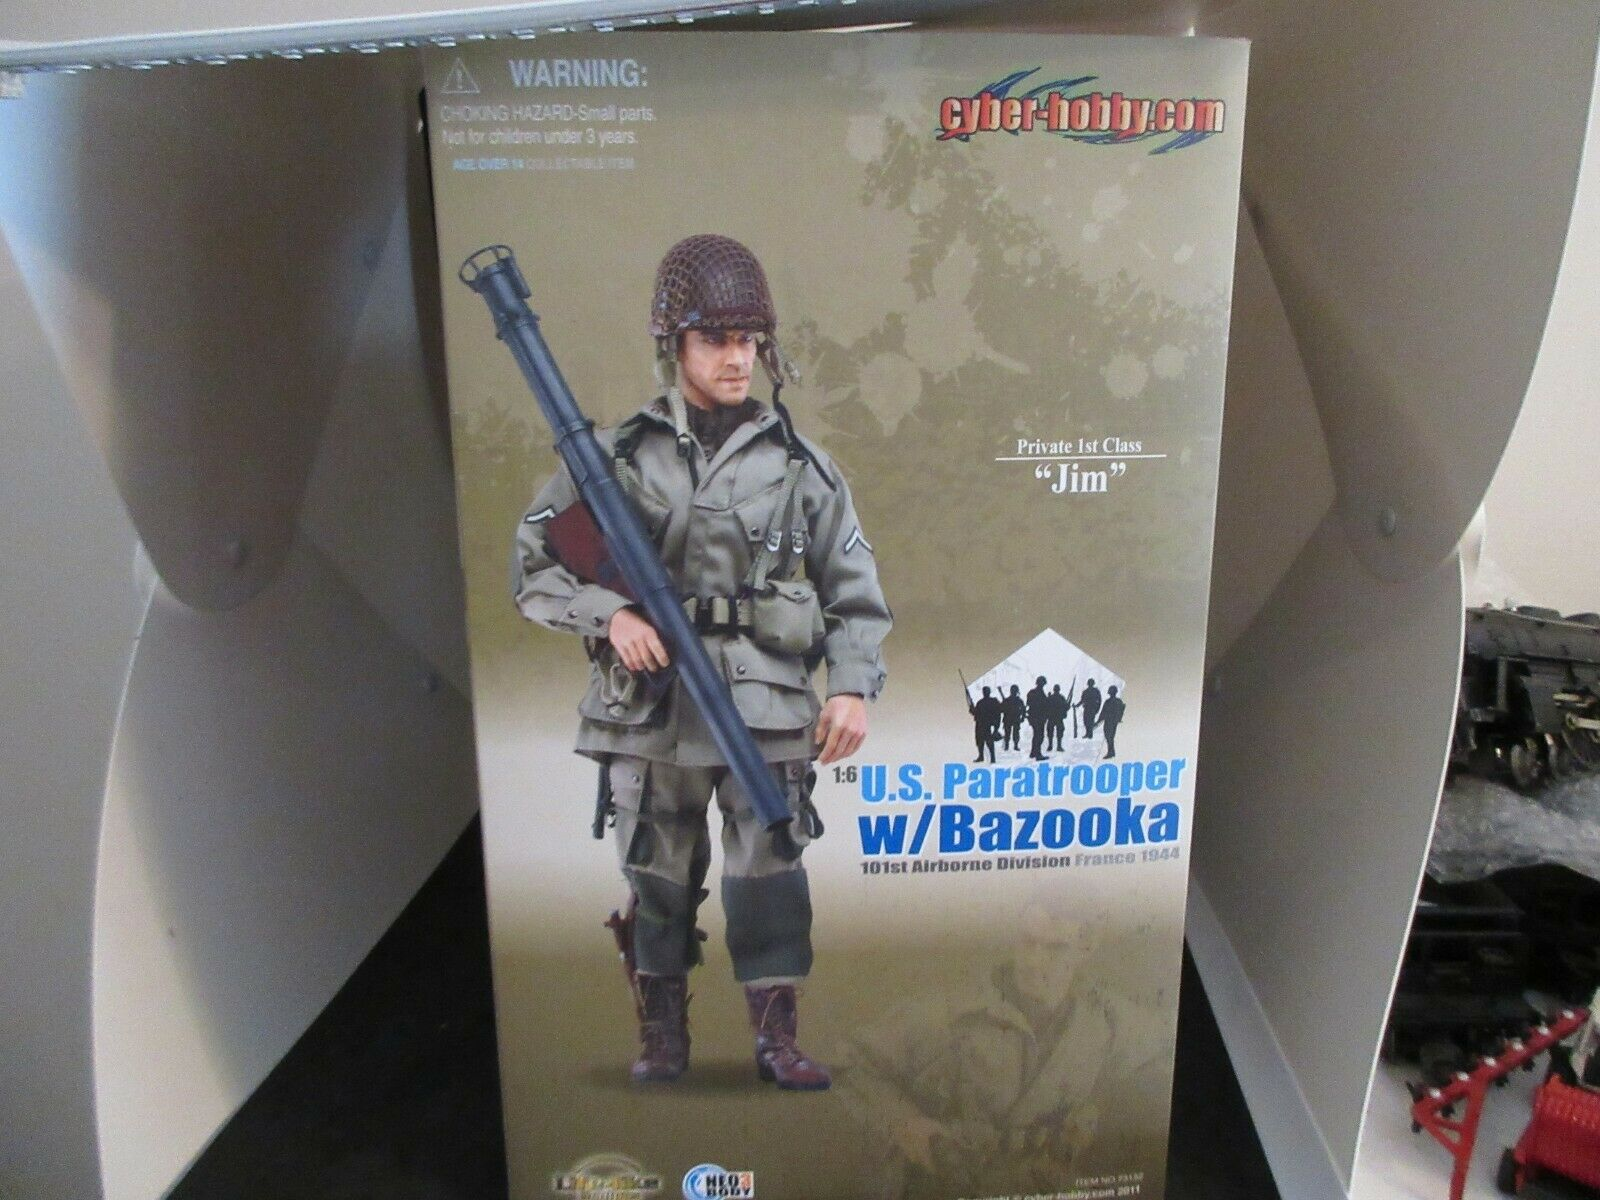 Cyber Hobby 1 6th Scale U.S. RANGER Paratrooper with Bazooka  Jim  Figurine  73152